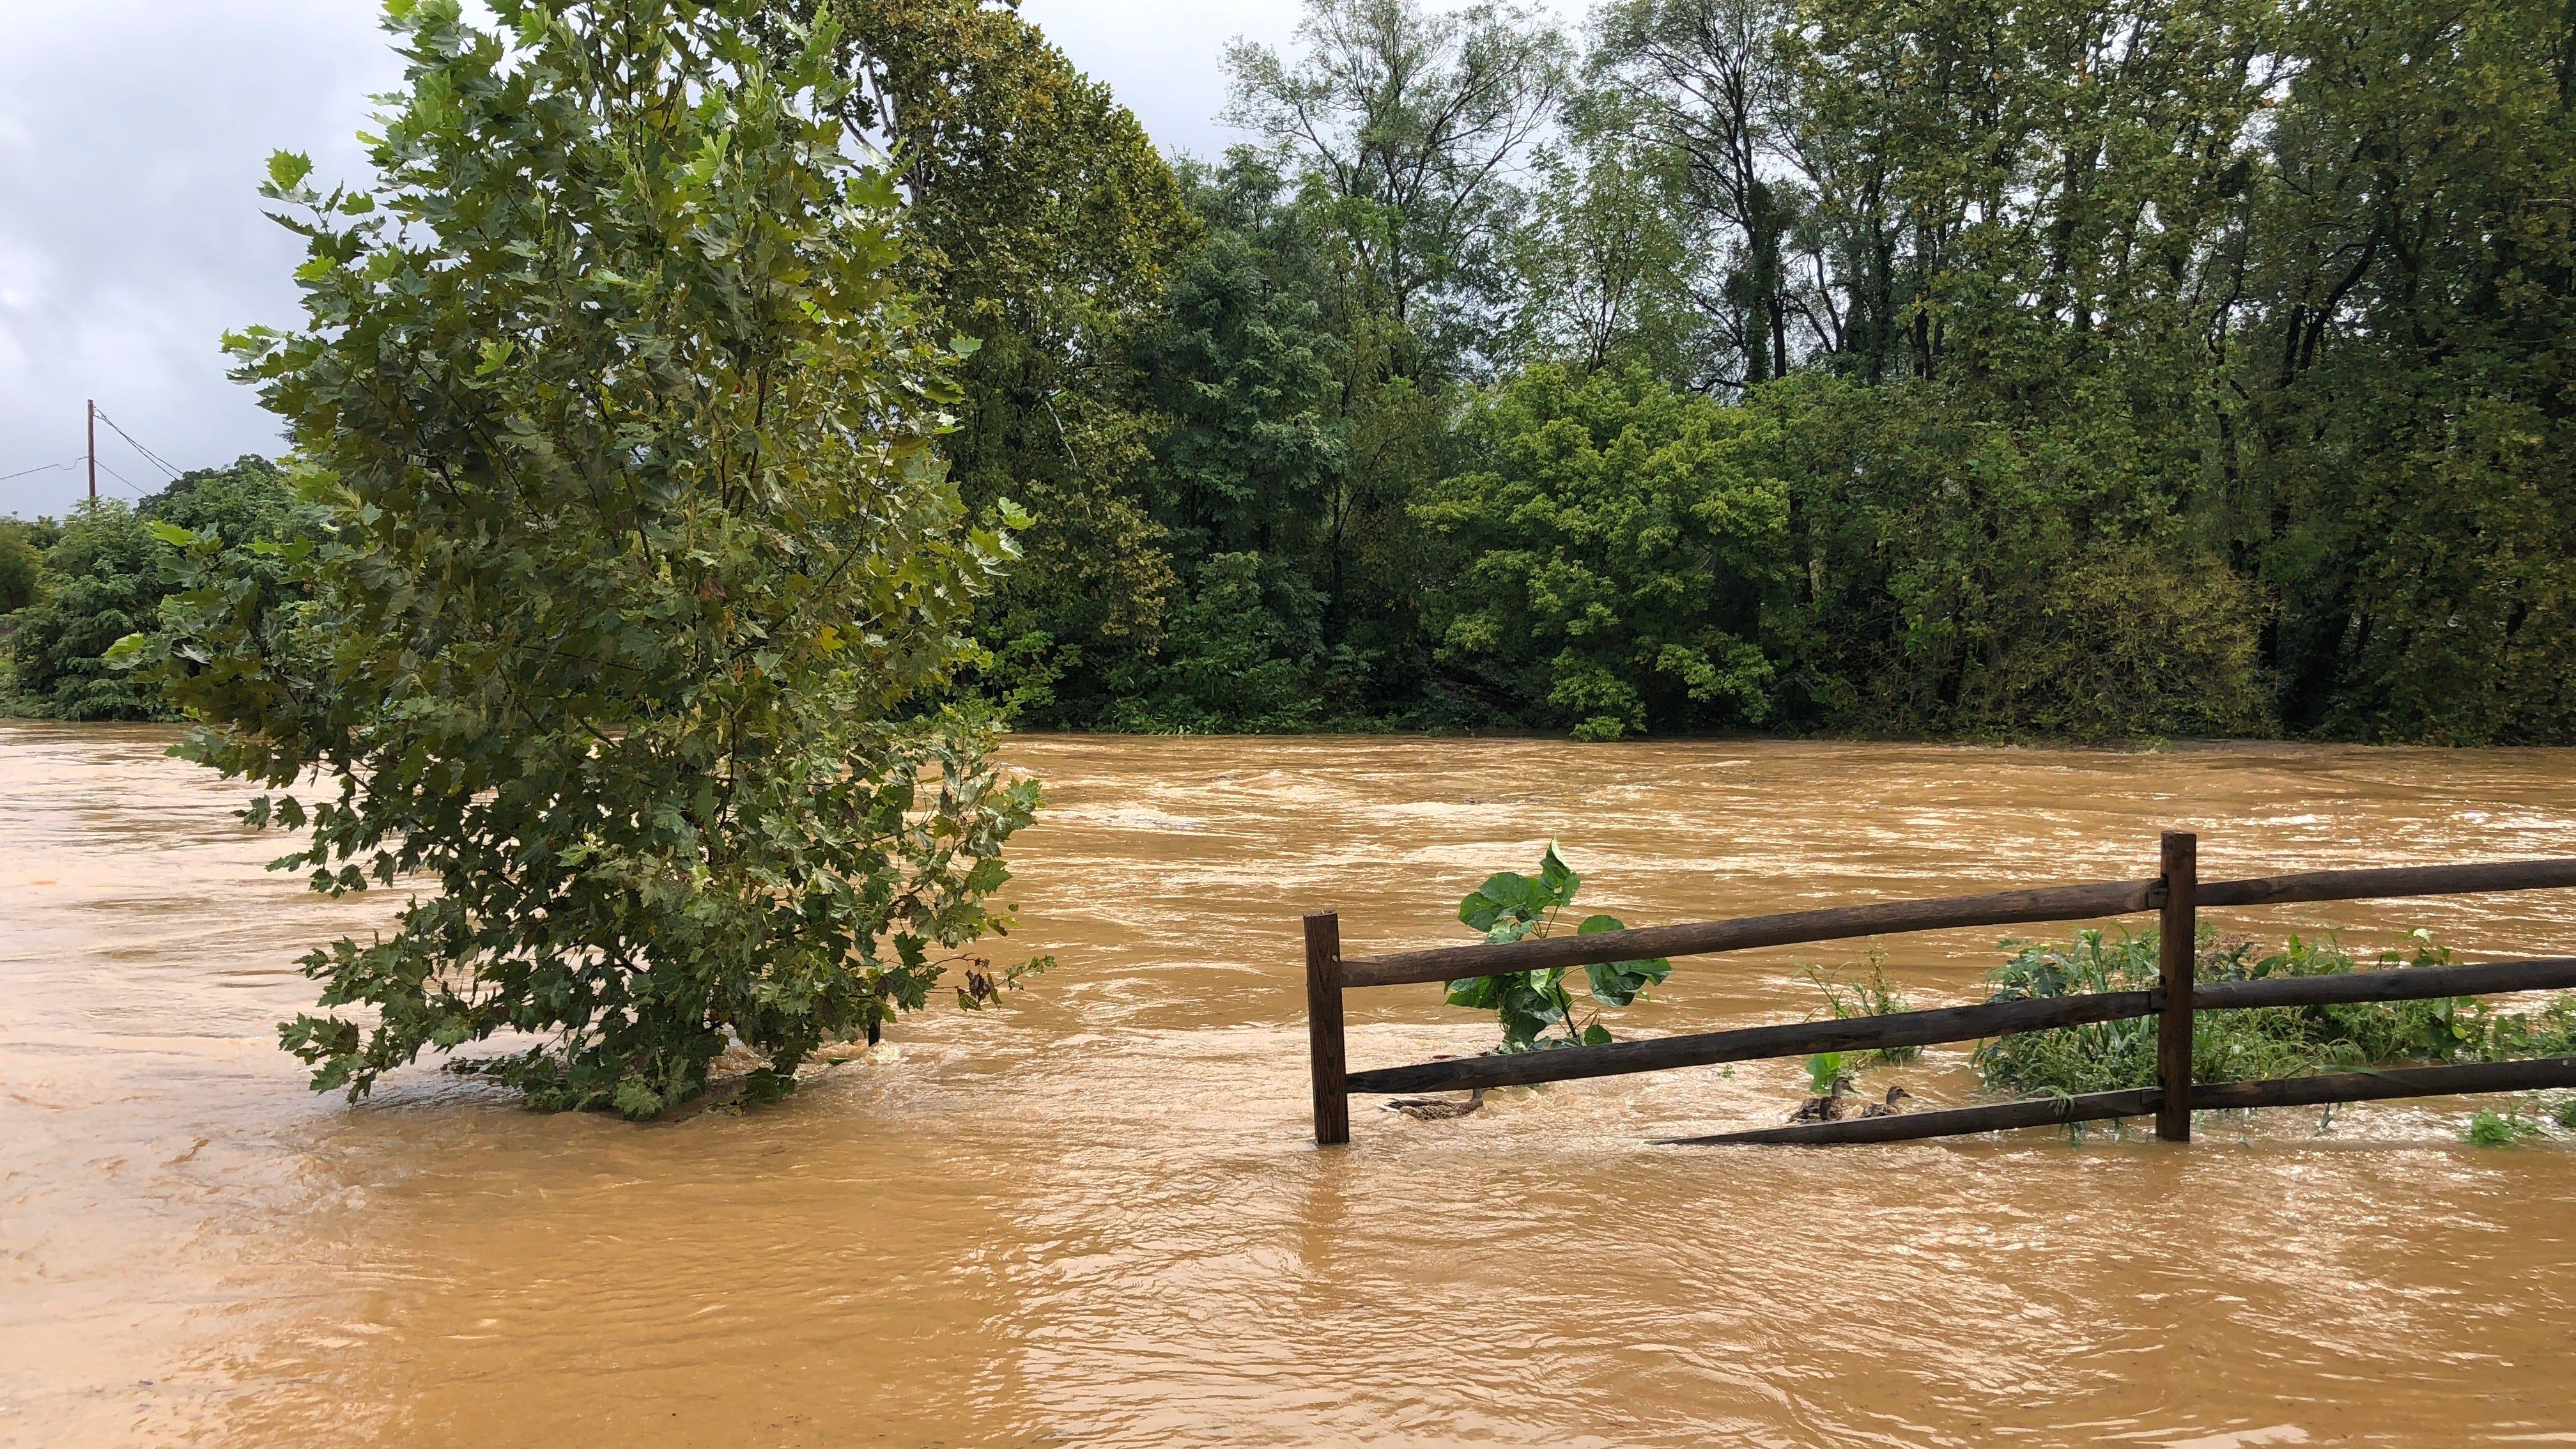 South River crested, flood warning still in effect for Staunton, Augusta, Waynesboro